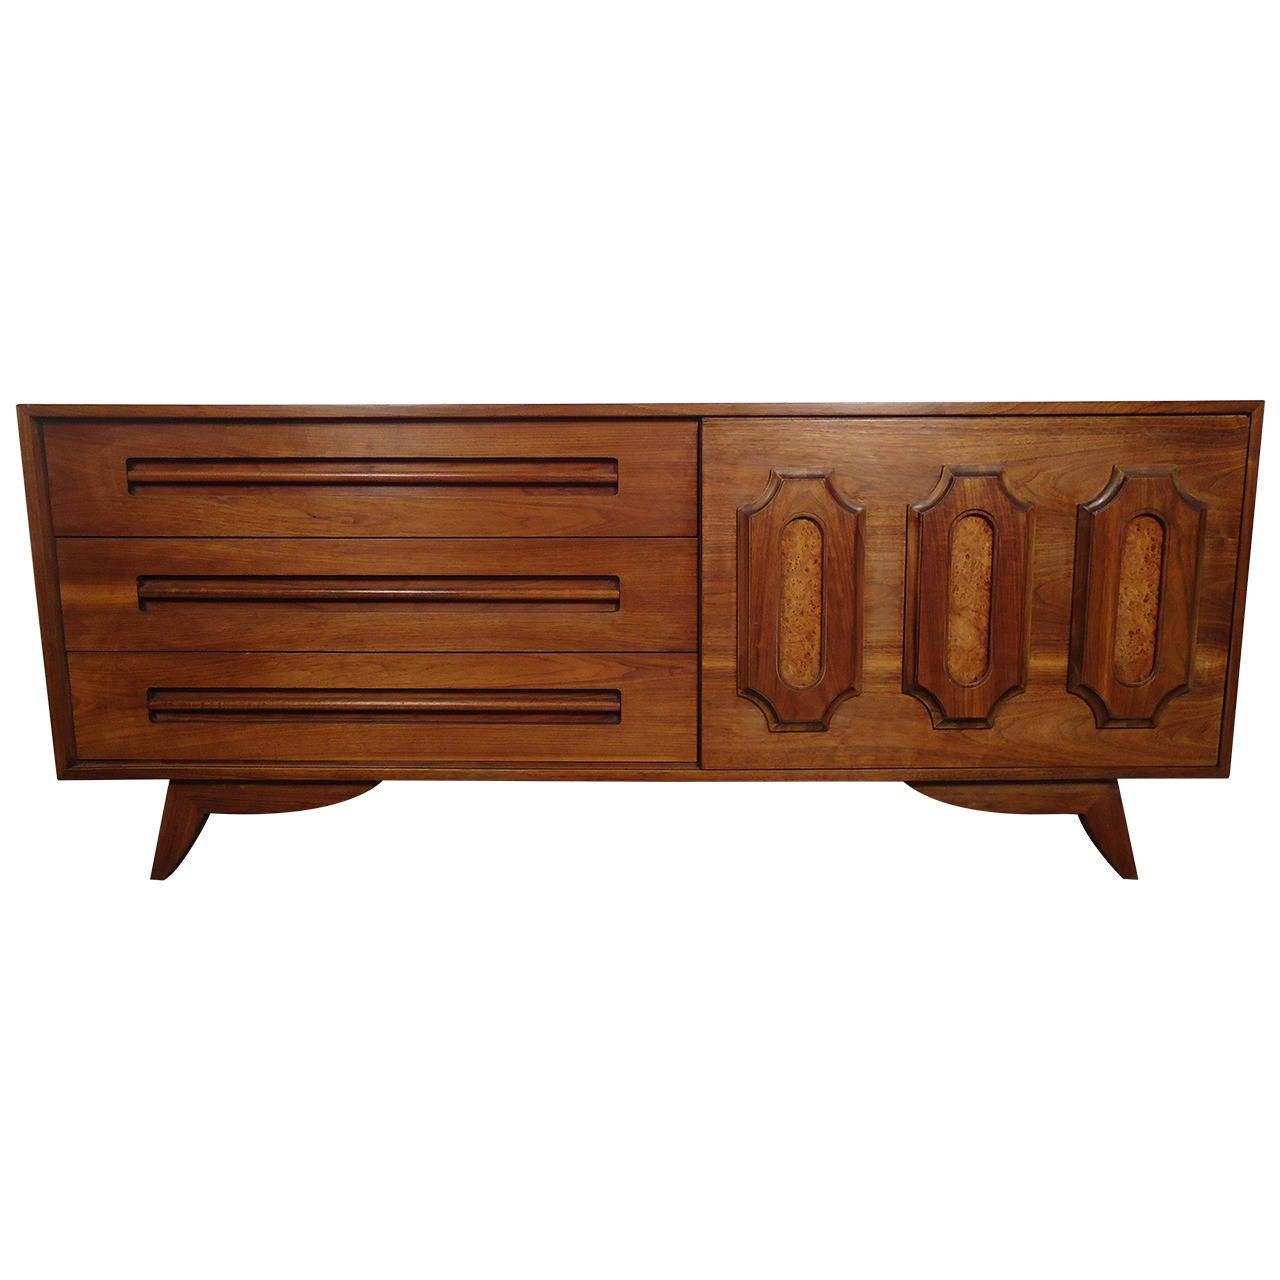 Mid century modern walnut and burl wood dresser at 1stdibs for Furniture 4 u